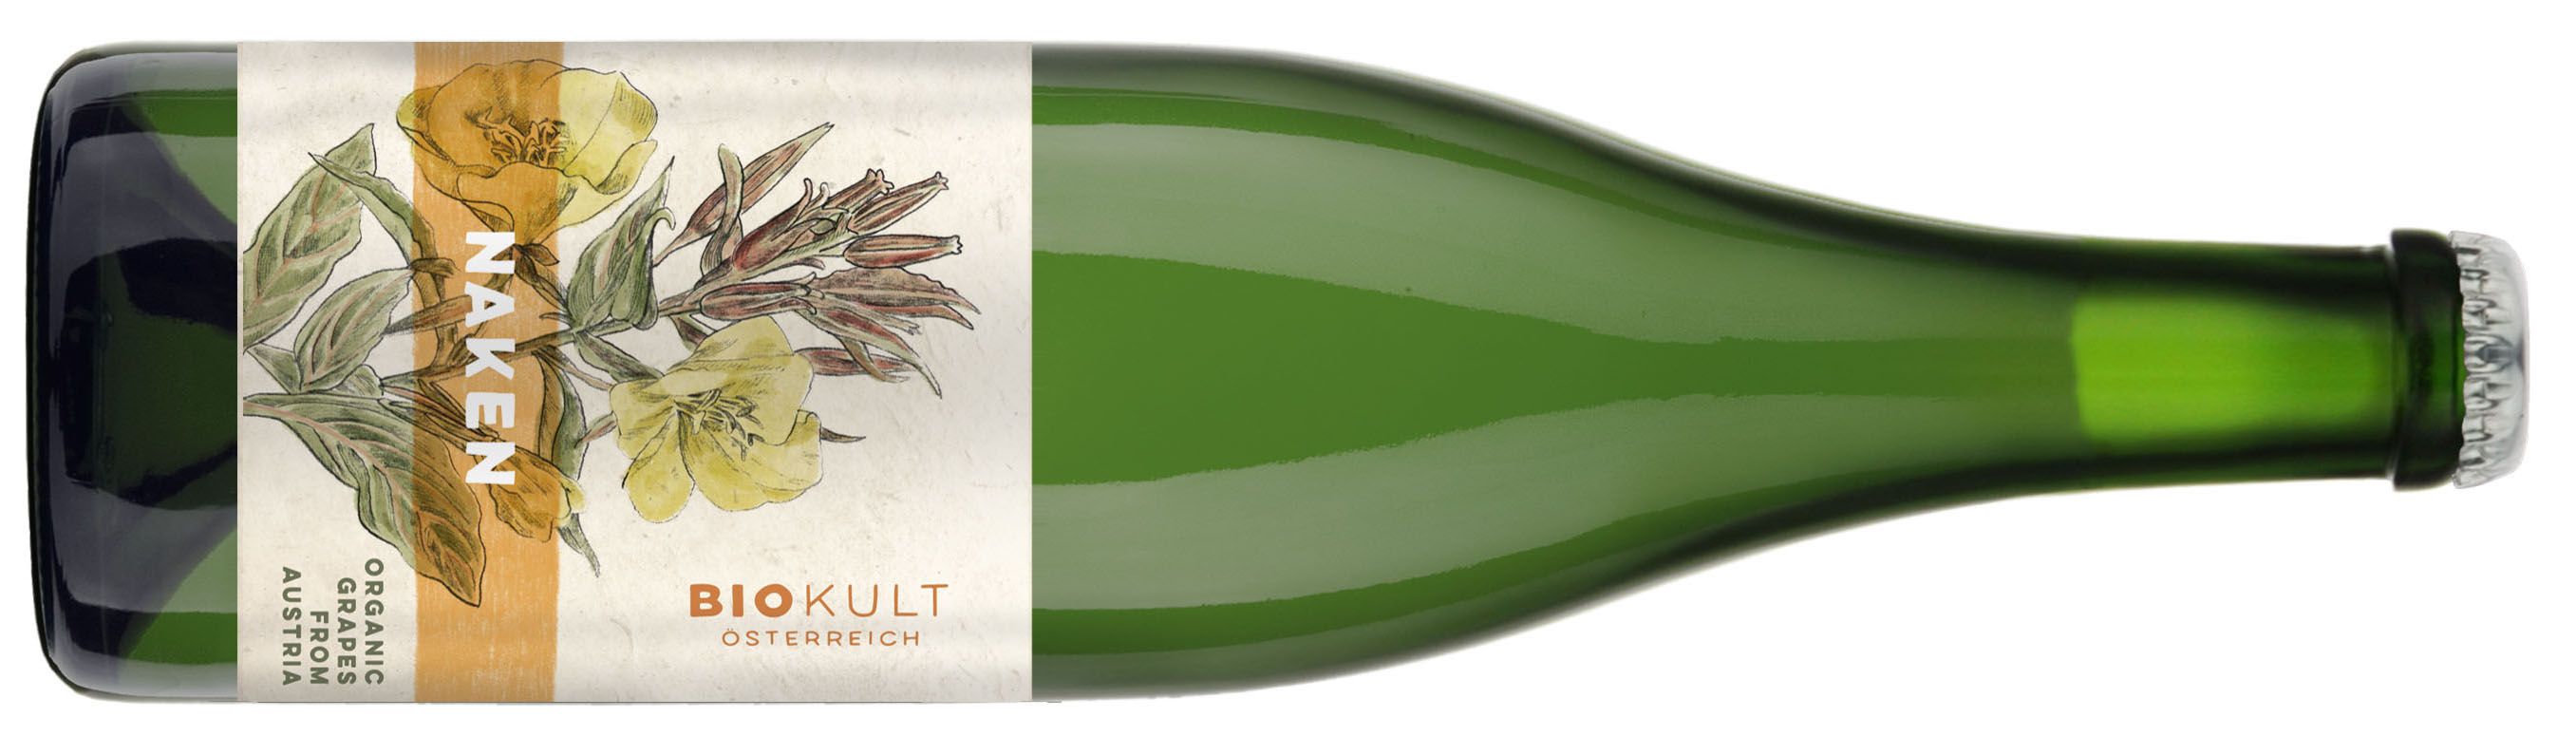 Best organic wines Biodynamic orange wine Naken